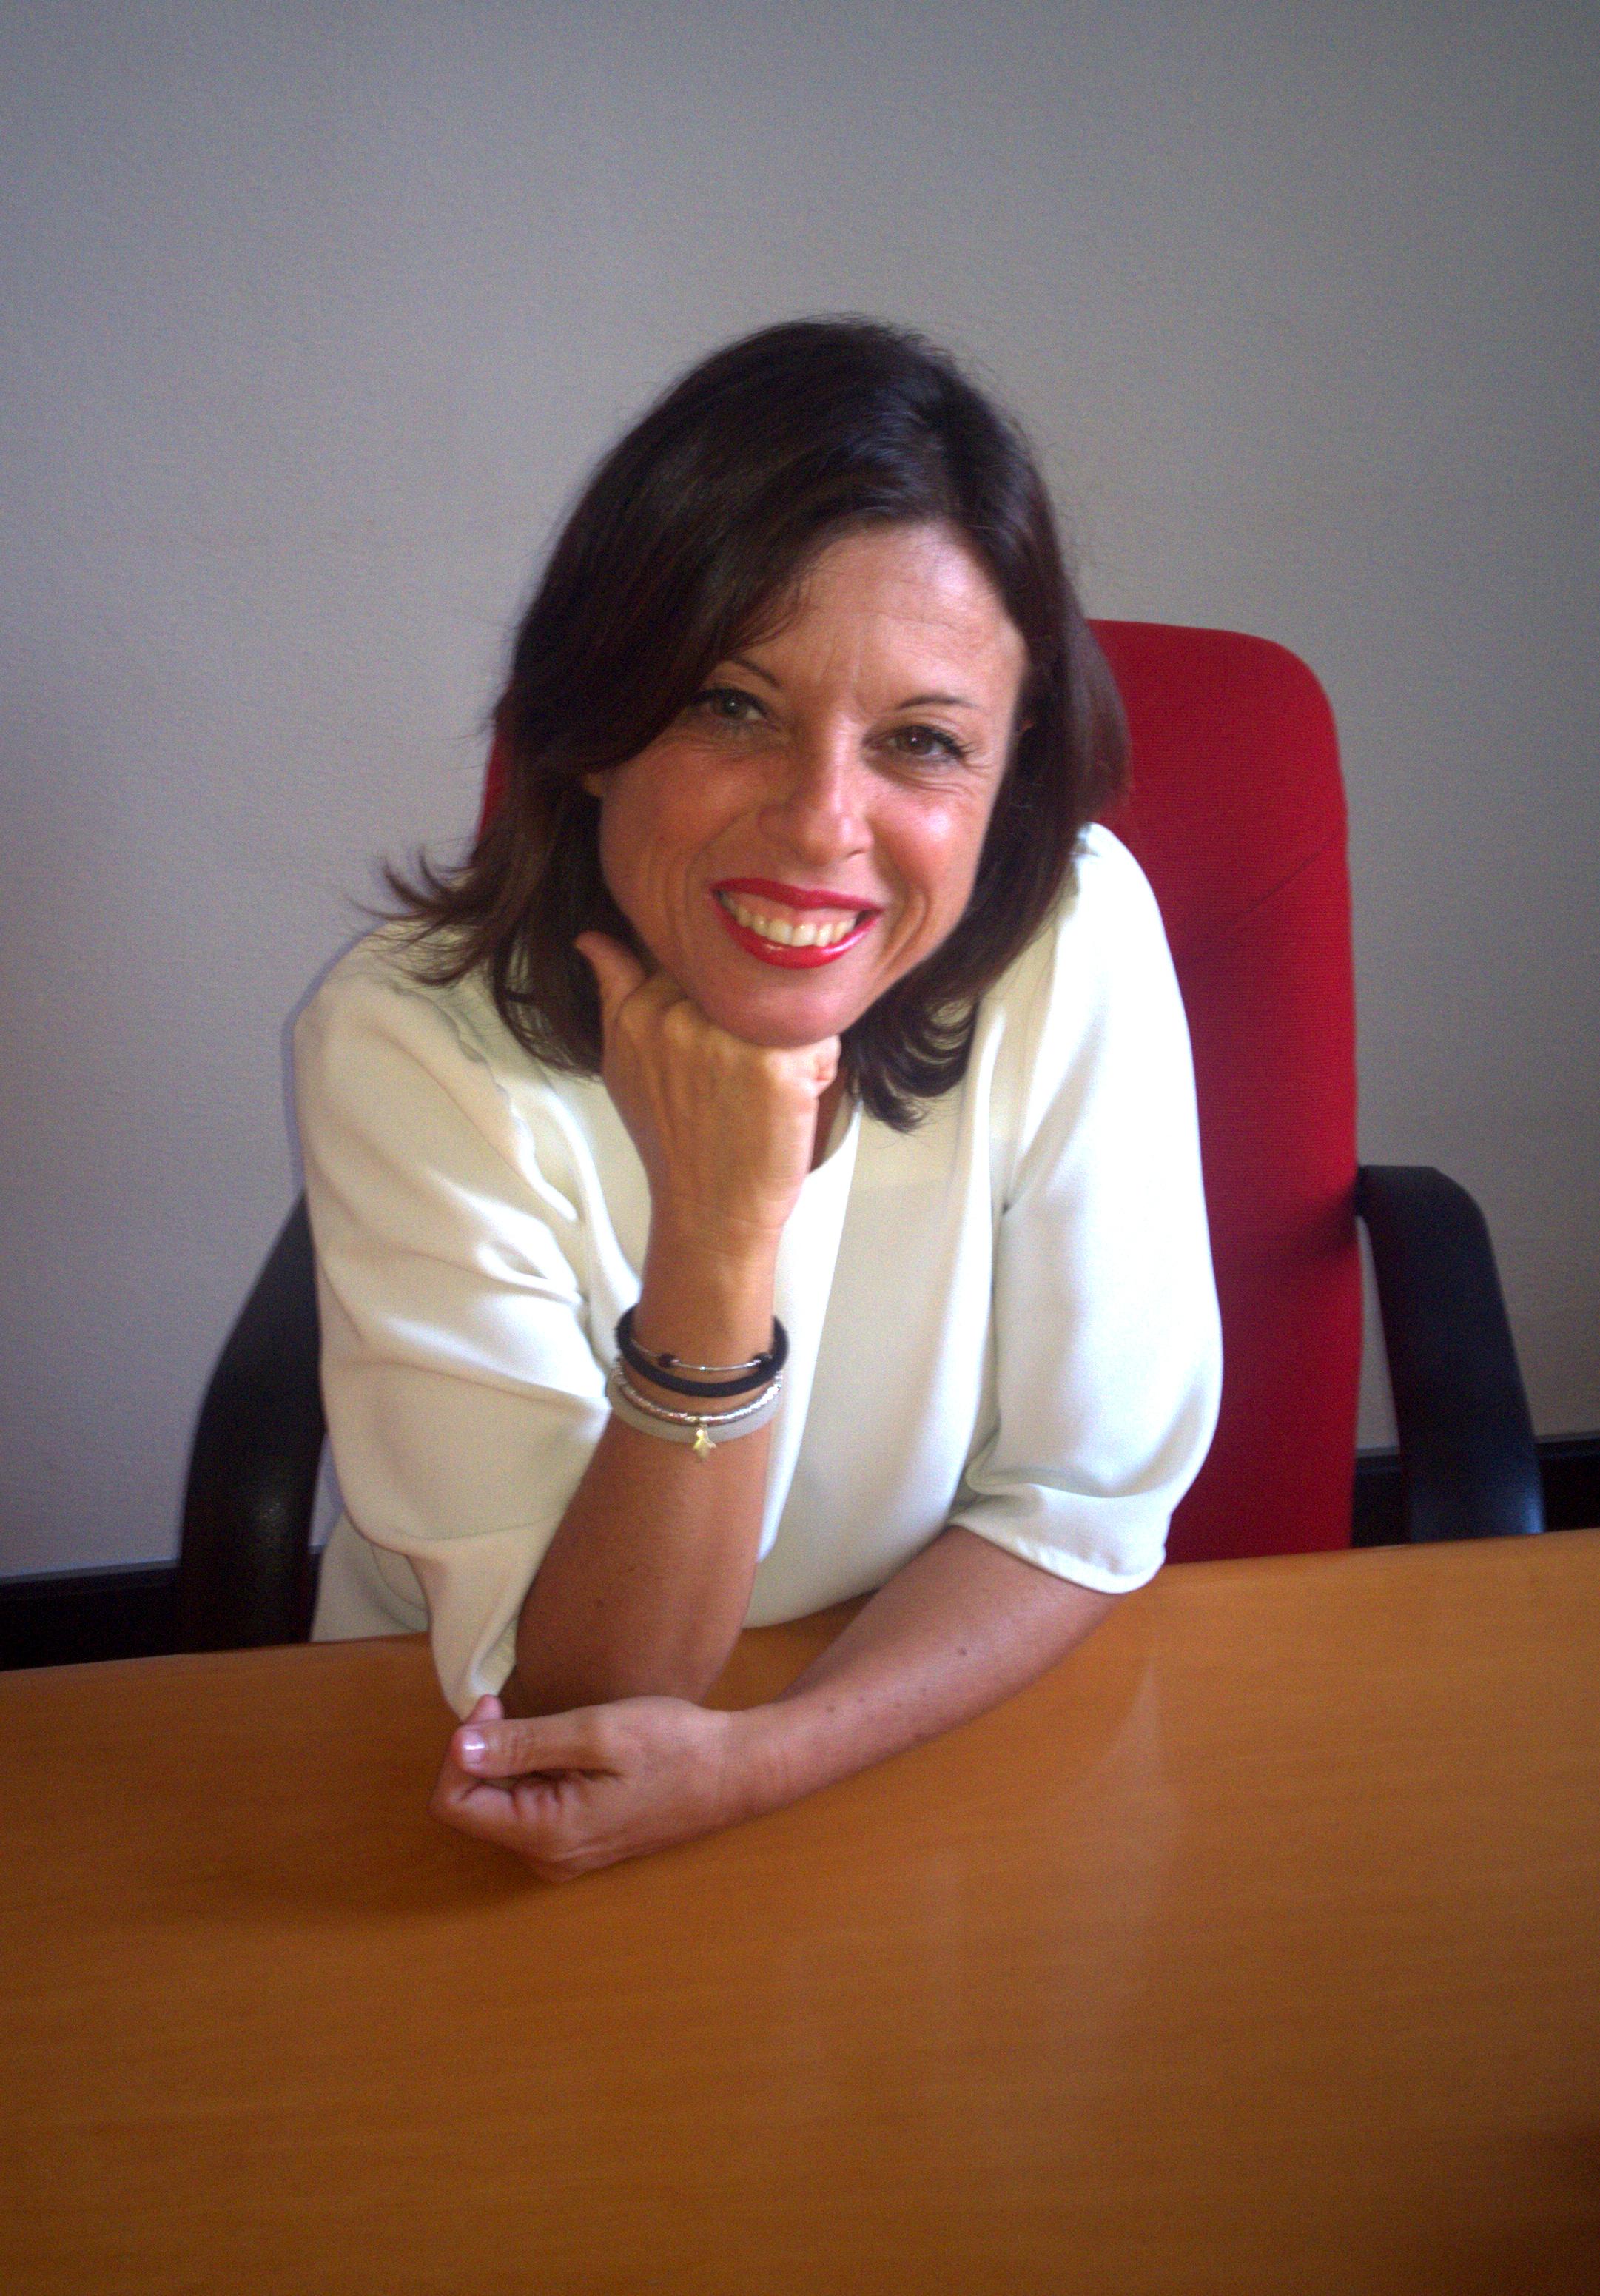 Rossella Macinante, Practice leader di NetConsulting cube